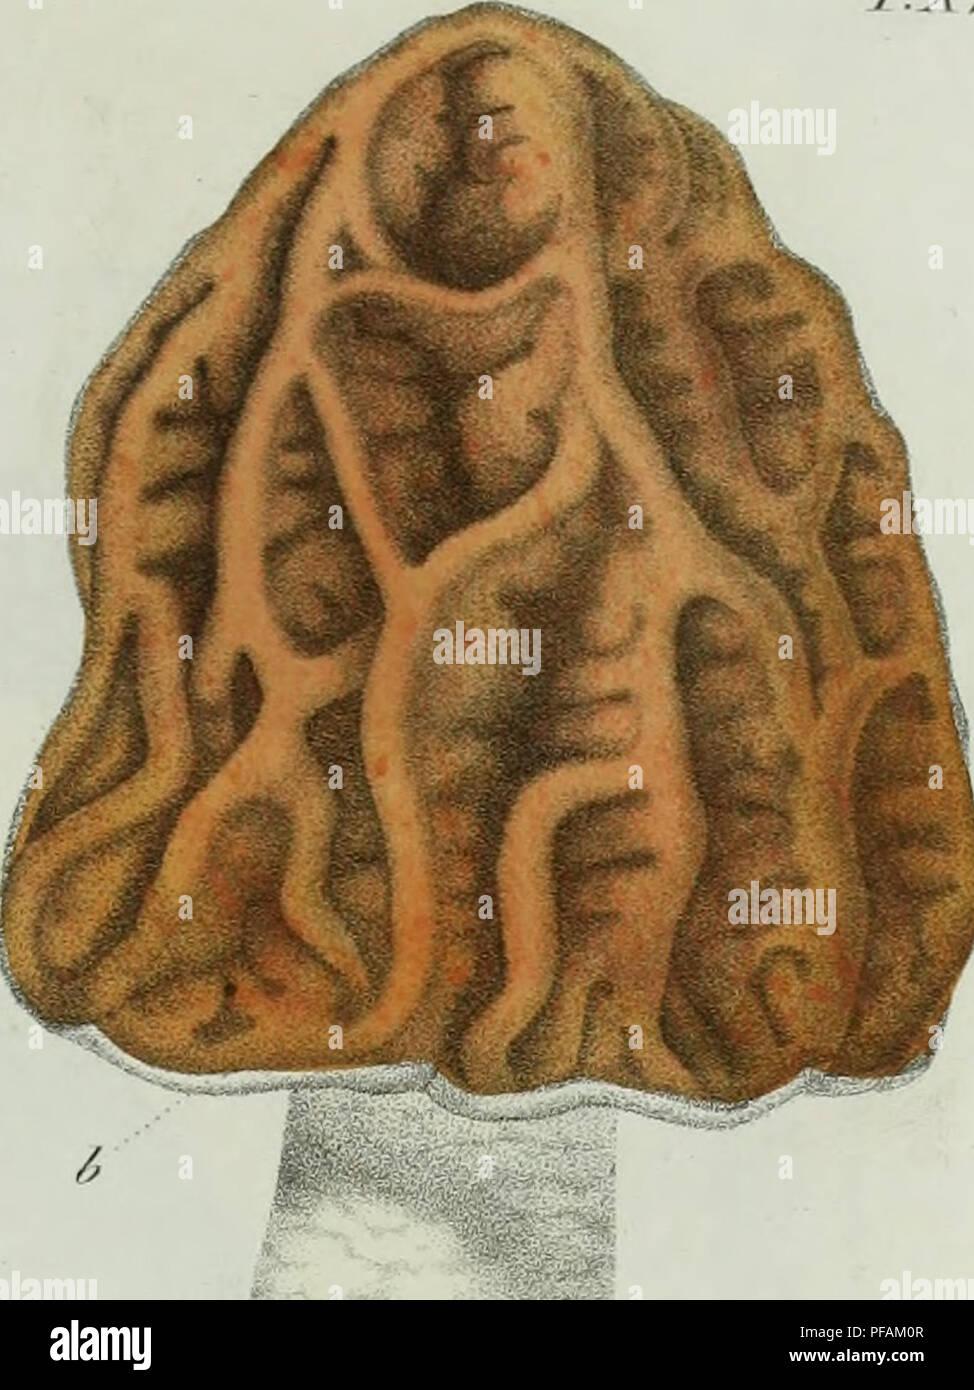 . Descrizione dei funghi mangerecci più comuni dell'Italia e de' velenosi che possono co' medesimi confondersi. Fungi; Mushrooms. 7/.r// Fu/Jf.. T&fniÃ. Please note that these images are extracted from scanned page images that may have been digitally enhanced for readability - coloration and appearance of these illustrations may not perfectly resemble the original work.. Vittadini, Carlo; Cavagna Sangiuliani di Gualdana, Antonio, conte, 1843-1913, former owner. IU-R. Milano, Rusconi - Stock Image